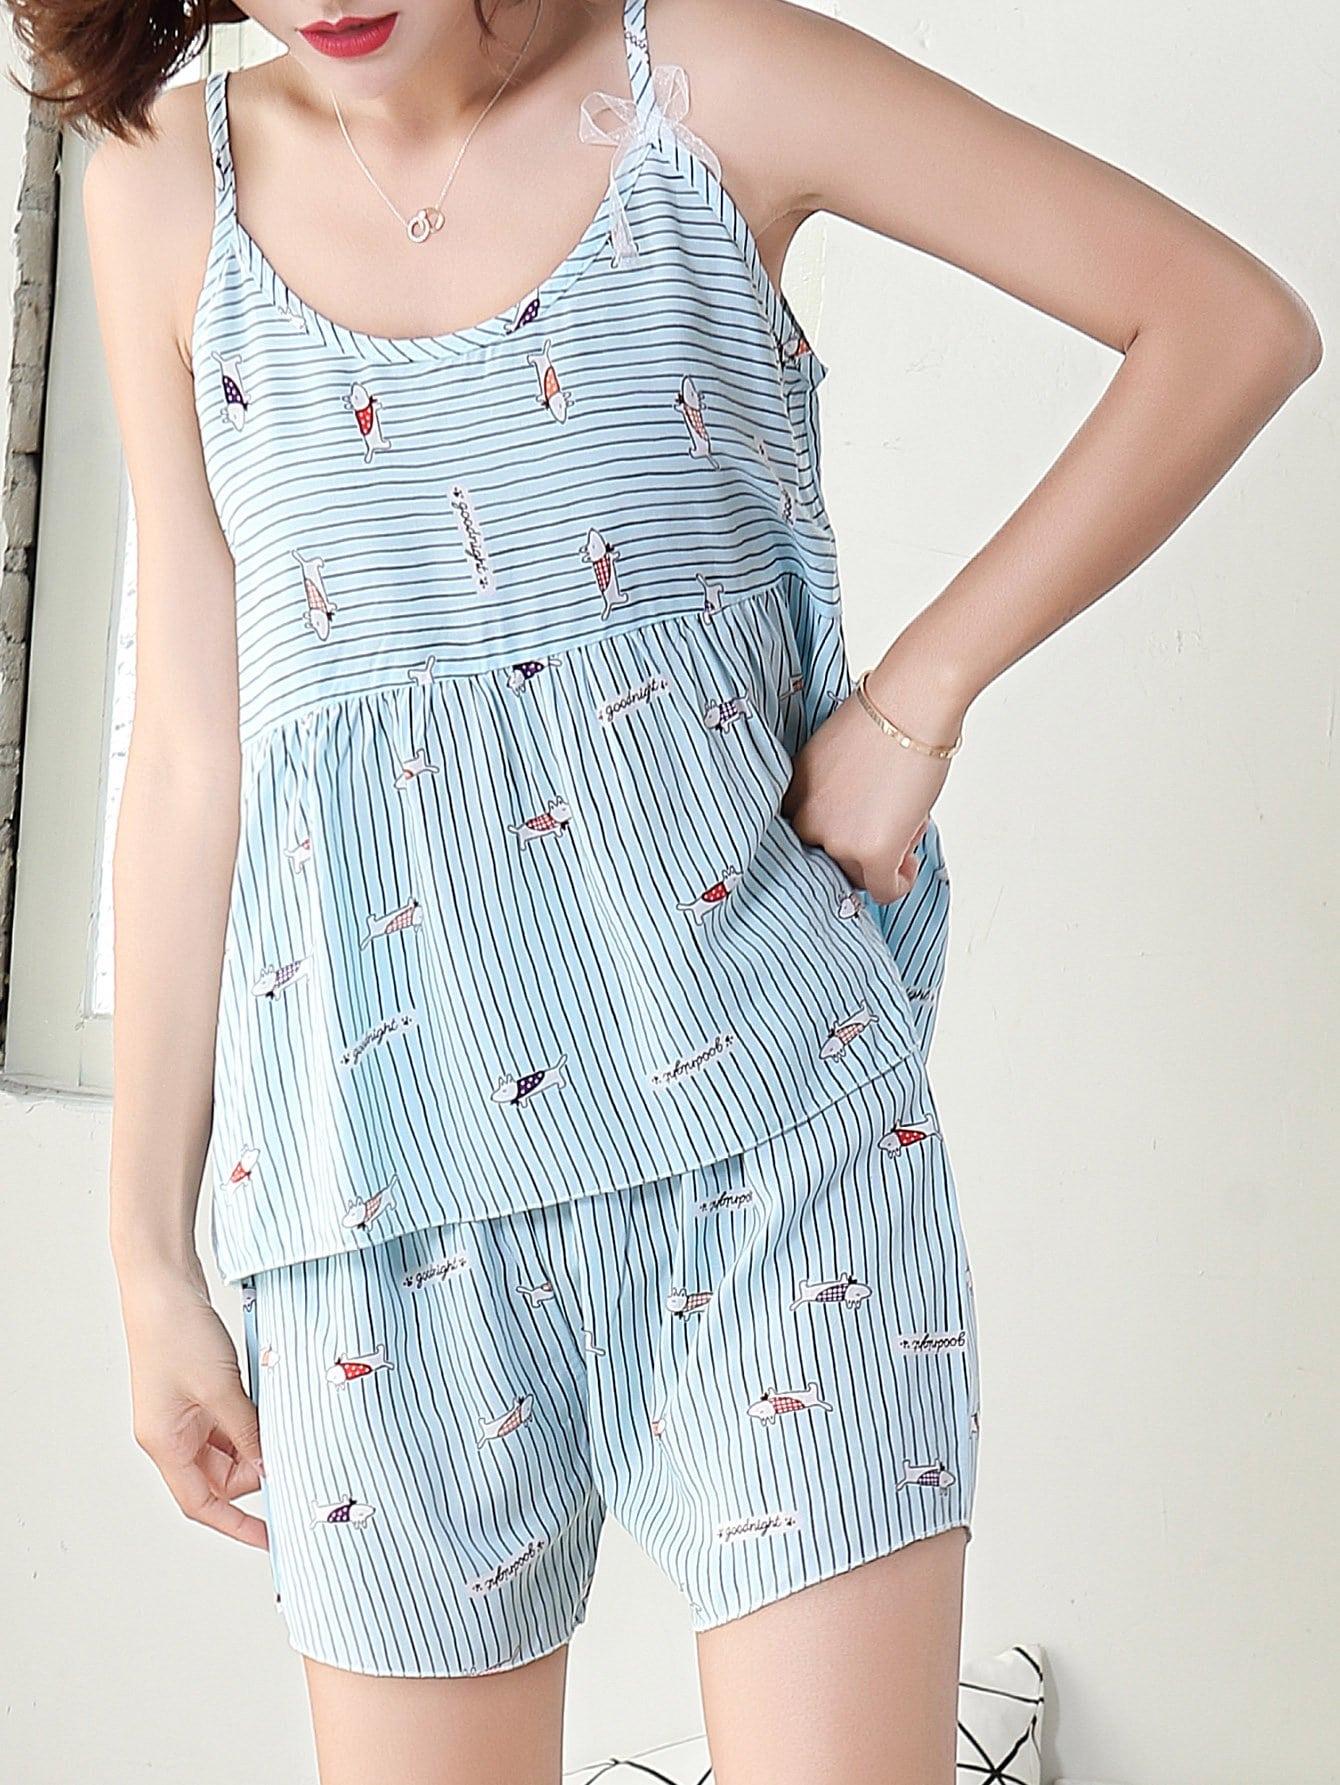 Dog Print Striped Cami Top & Shorts PJ Set dog print top